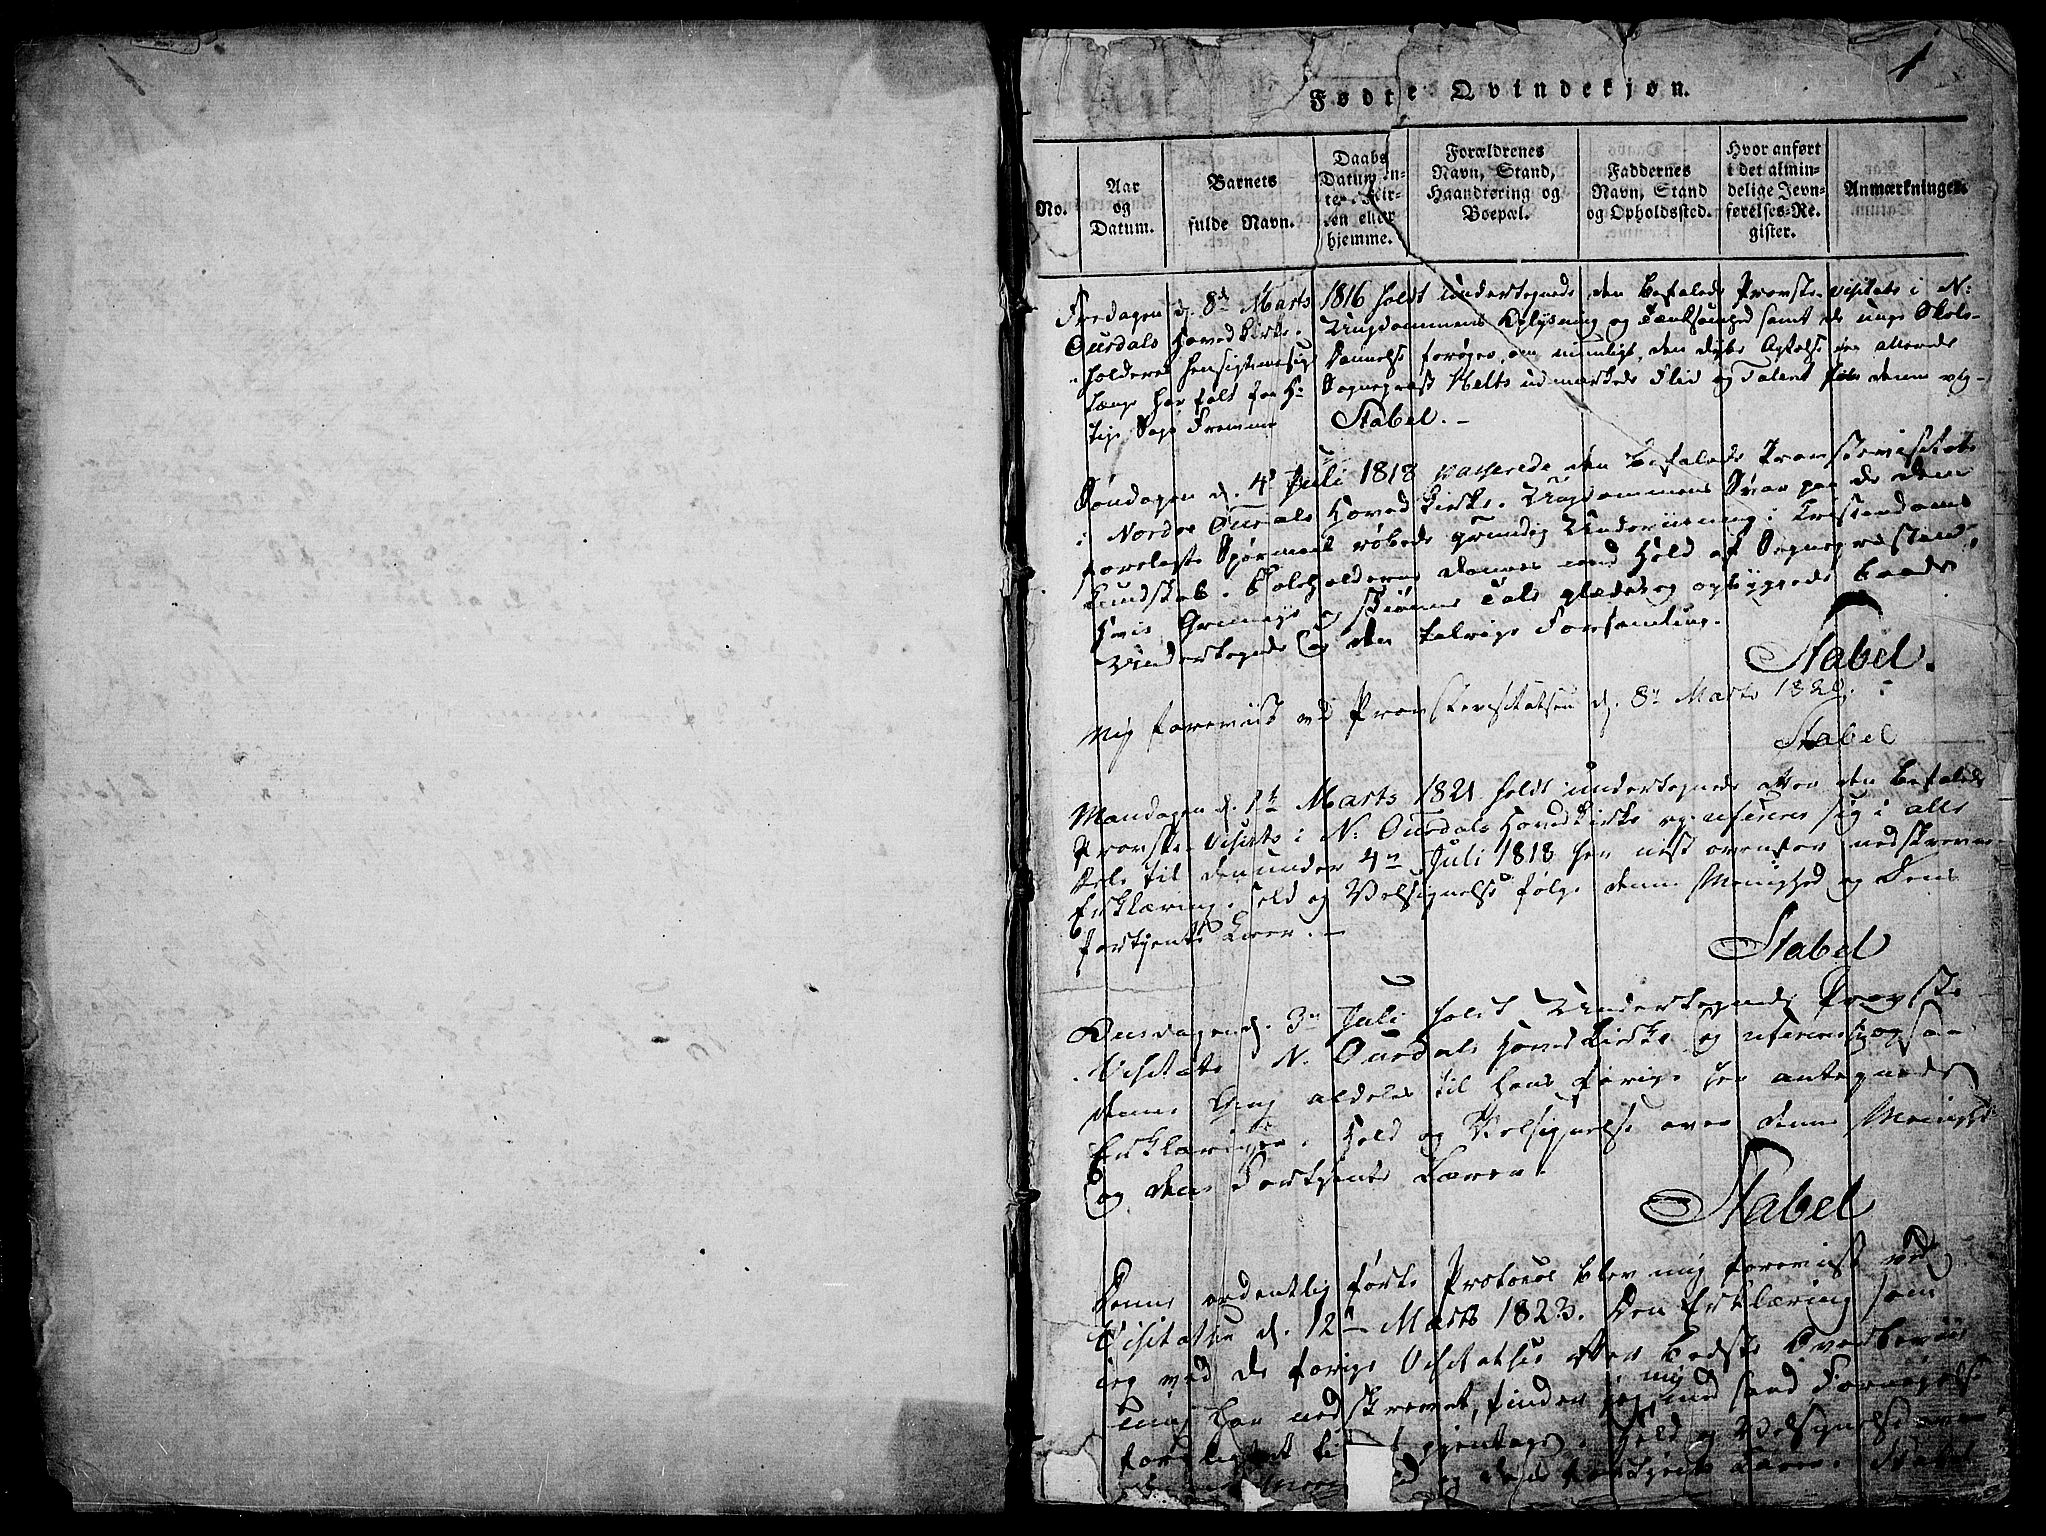 SAH, Nord-Aurdal prestekontor, Ministerialbok nr. 2, 1816-1828, s. 1